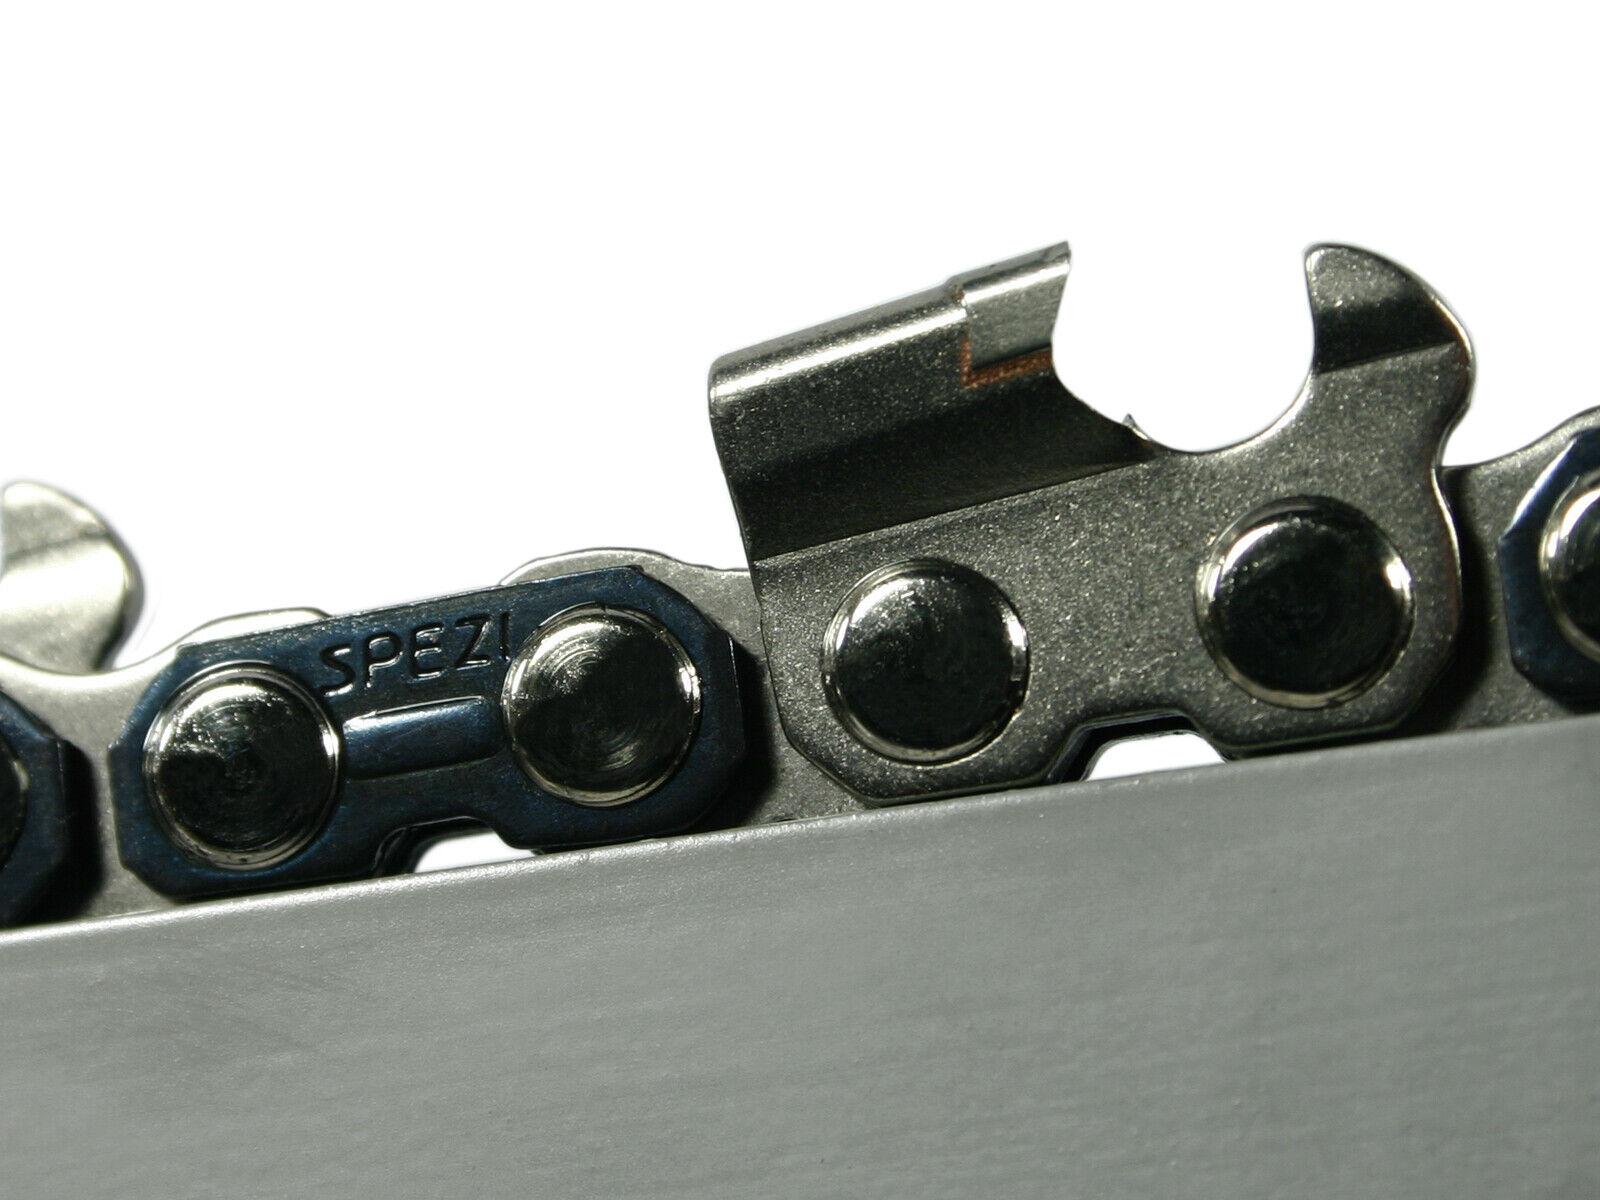 Metal duro cadena sierra adecuado para Husqvarna 50 55 cm 3 8  76 TG 1,5 mm Cochebide